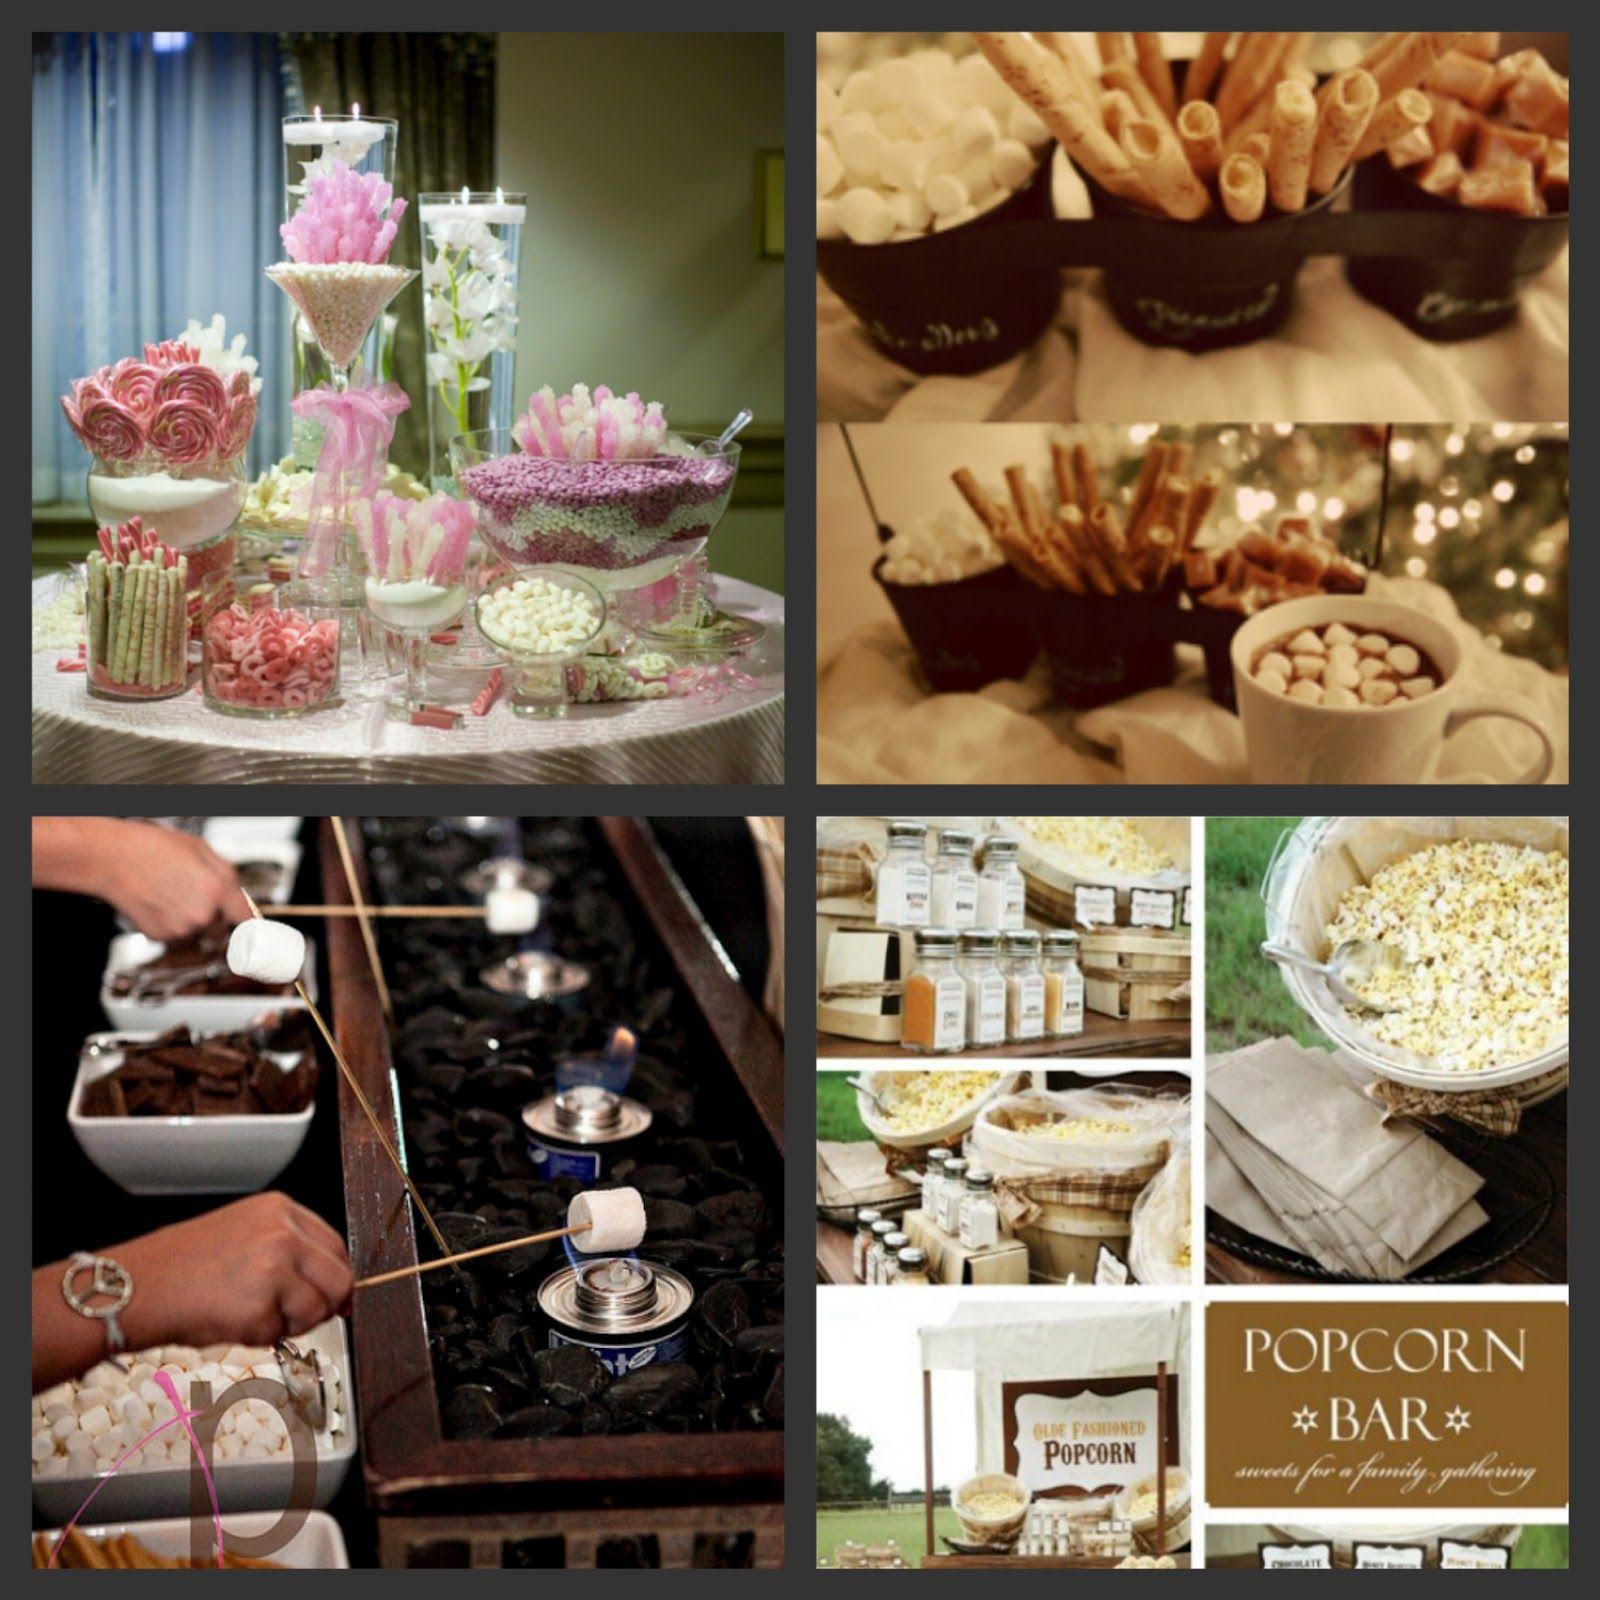 food bar ideas | Weddings Are Fun Blog: Wedding Trend: Food Bars and ...